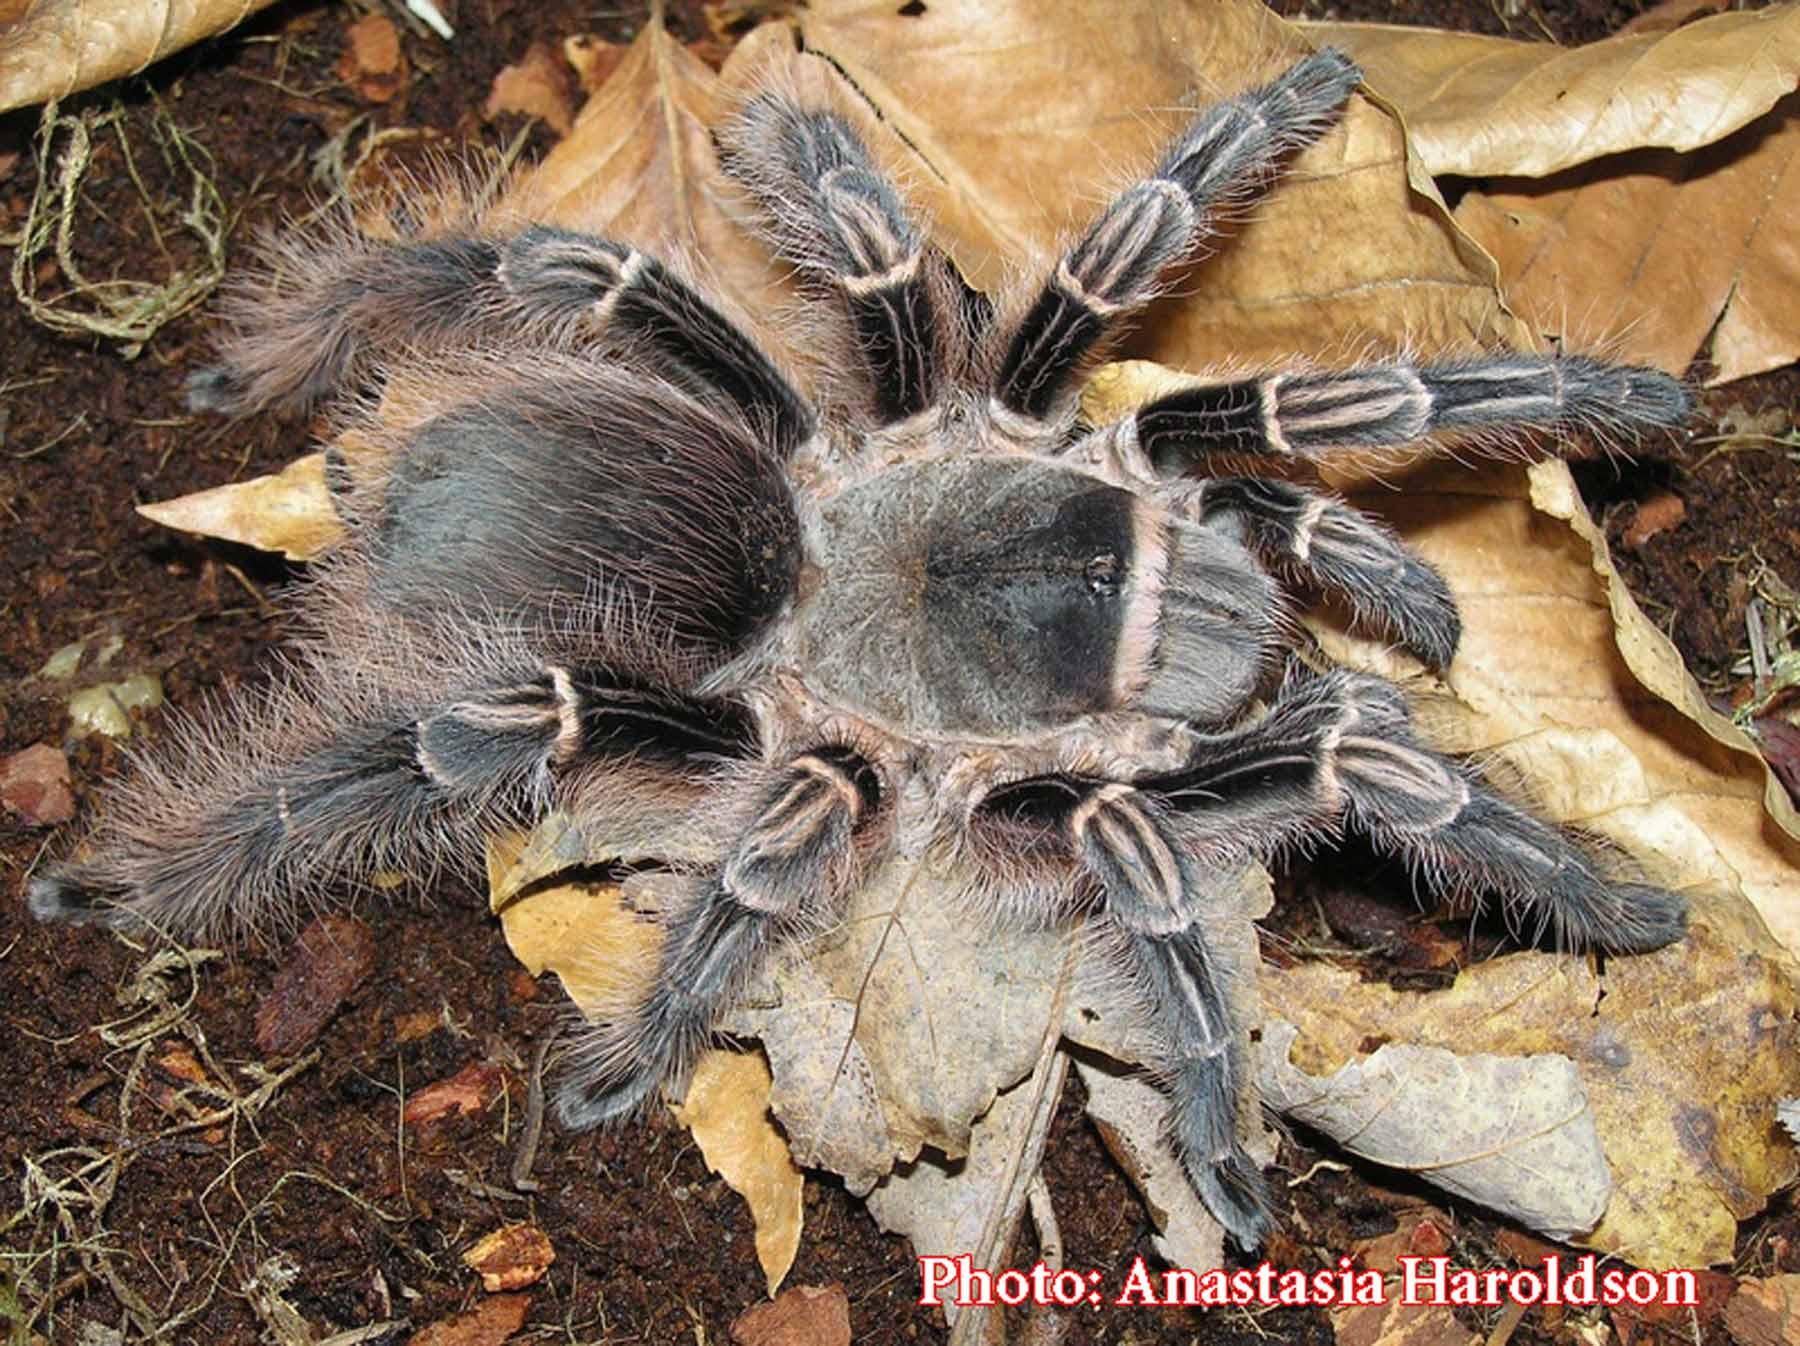 The Best Tarantula Species for Beginners | Tom's Big Spiders